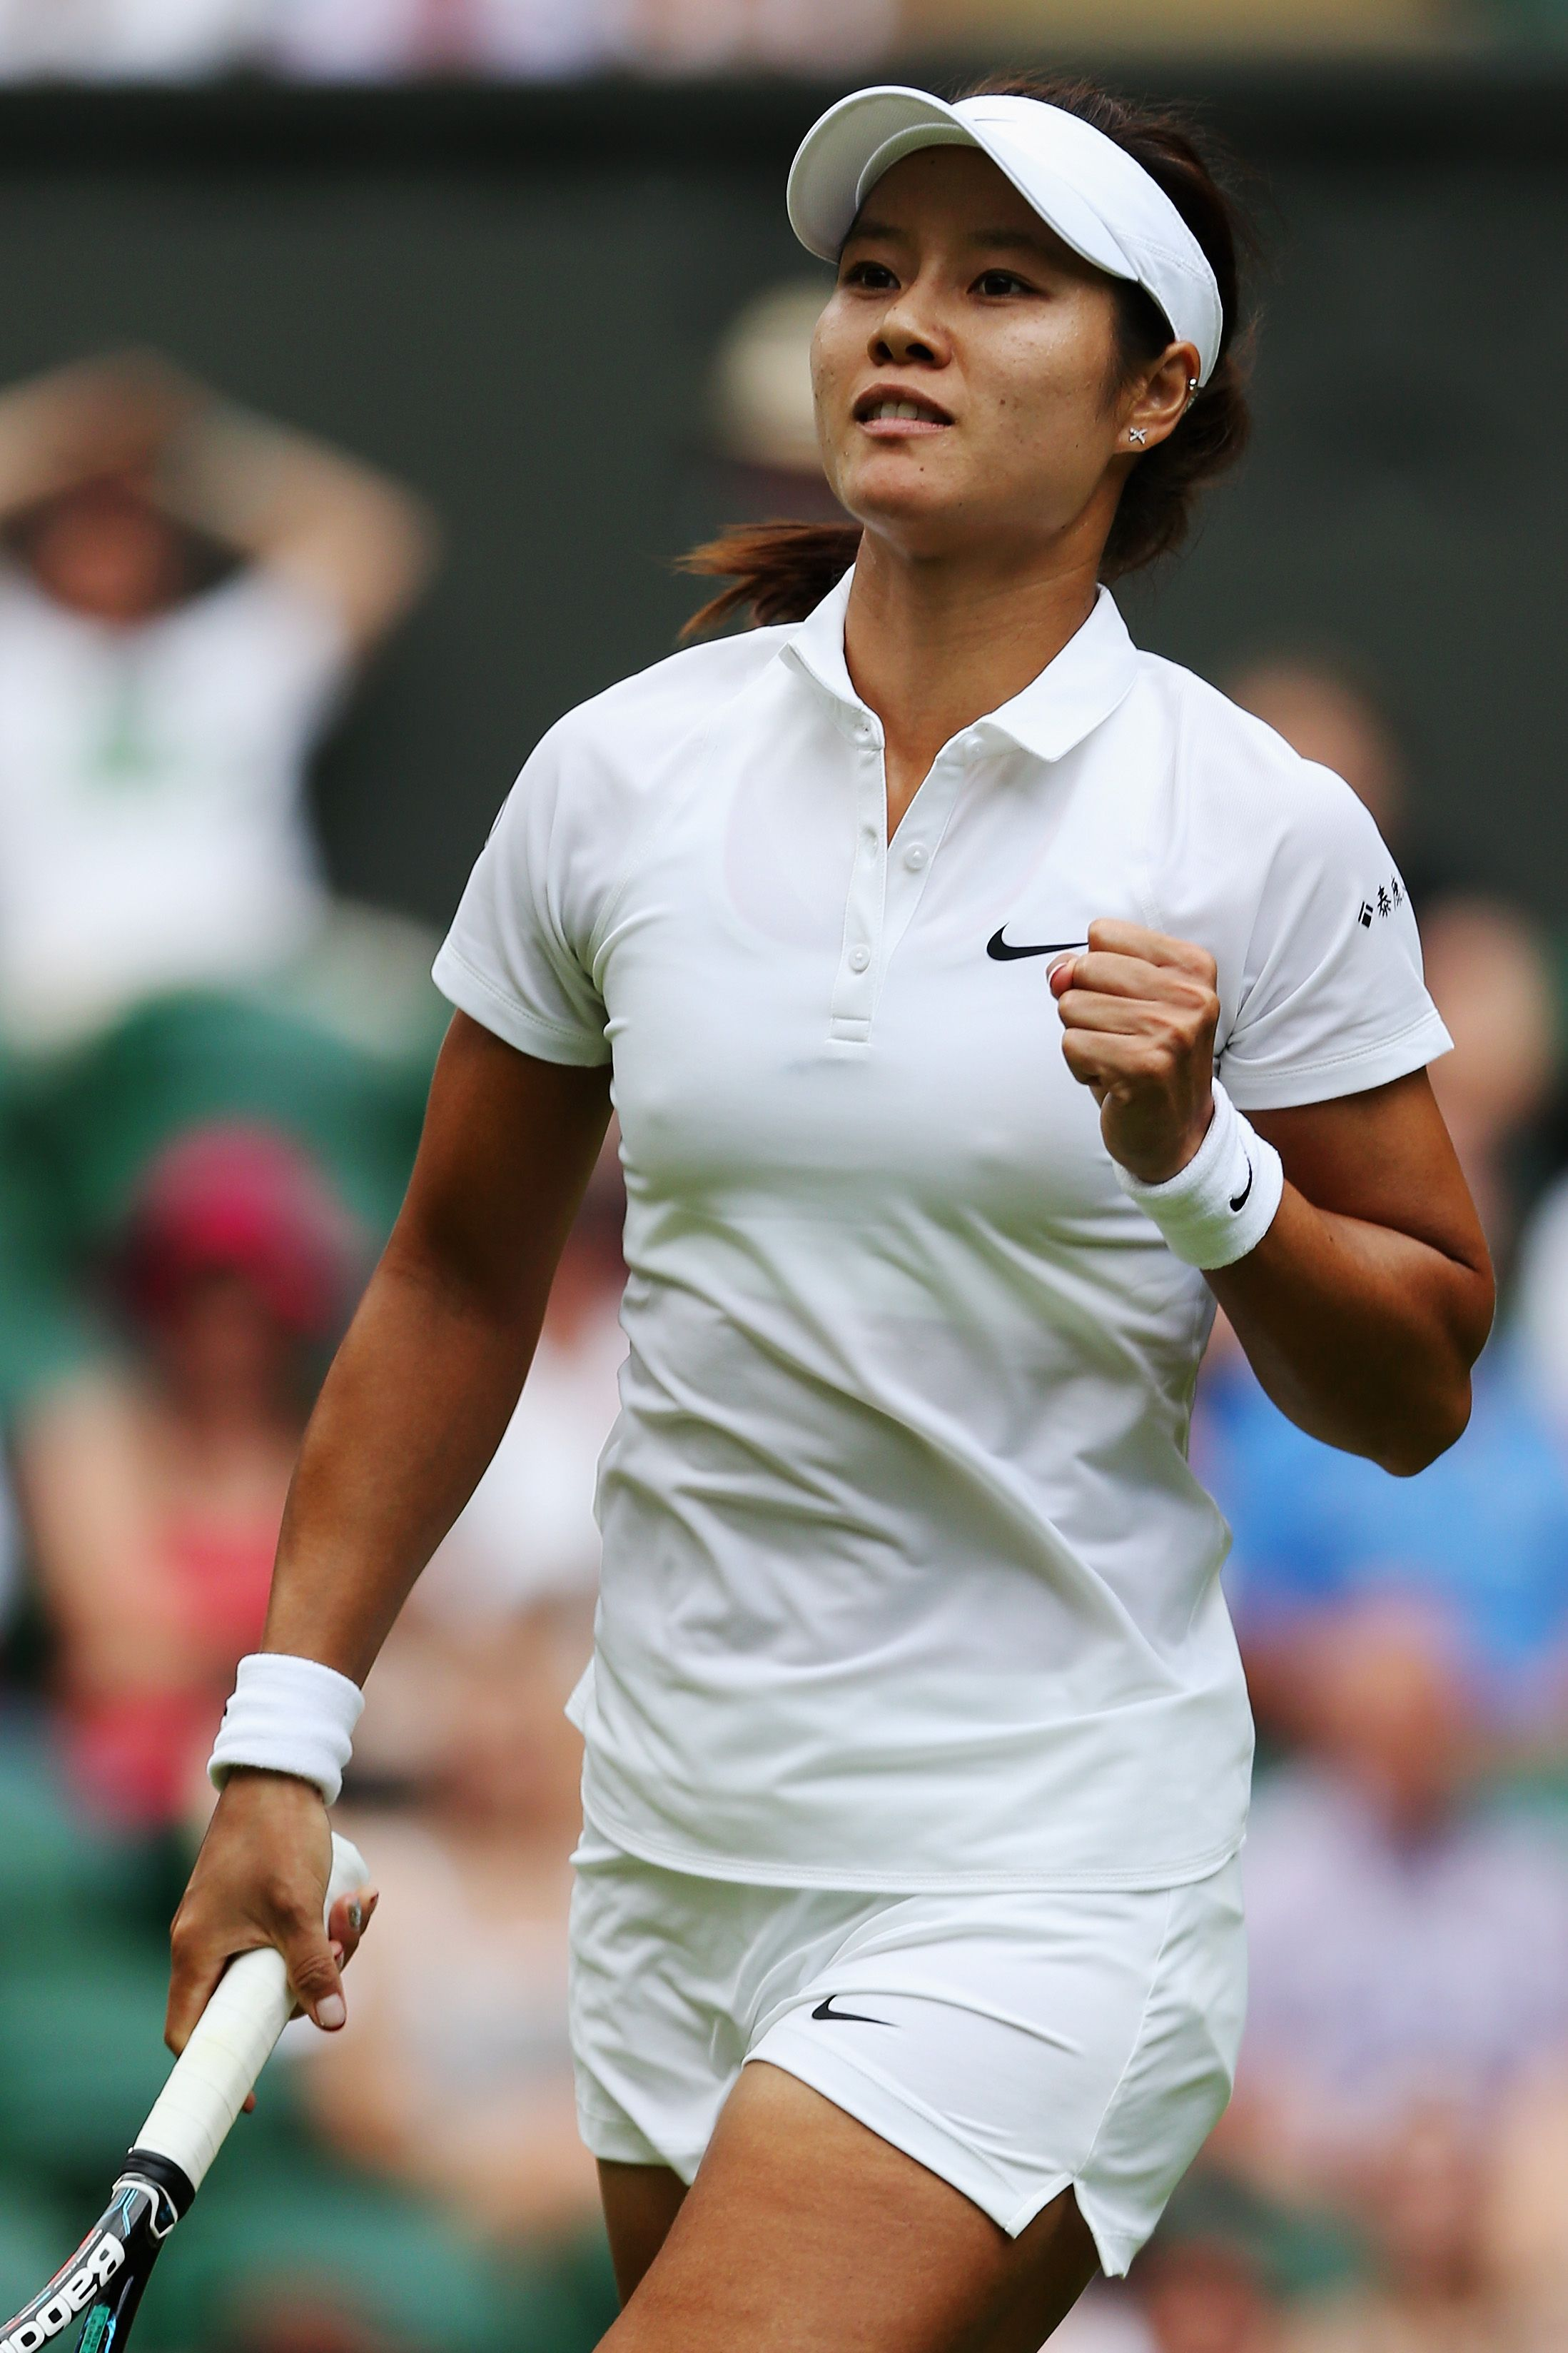 Li Na at 2013 Wimbledon | |chinadaily.com.cn